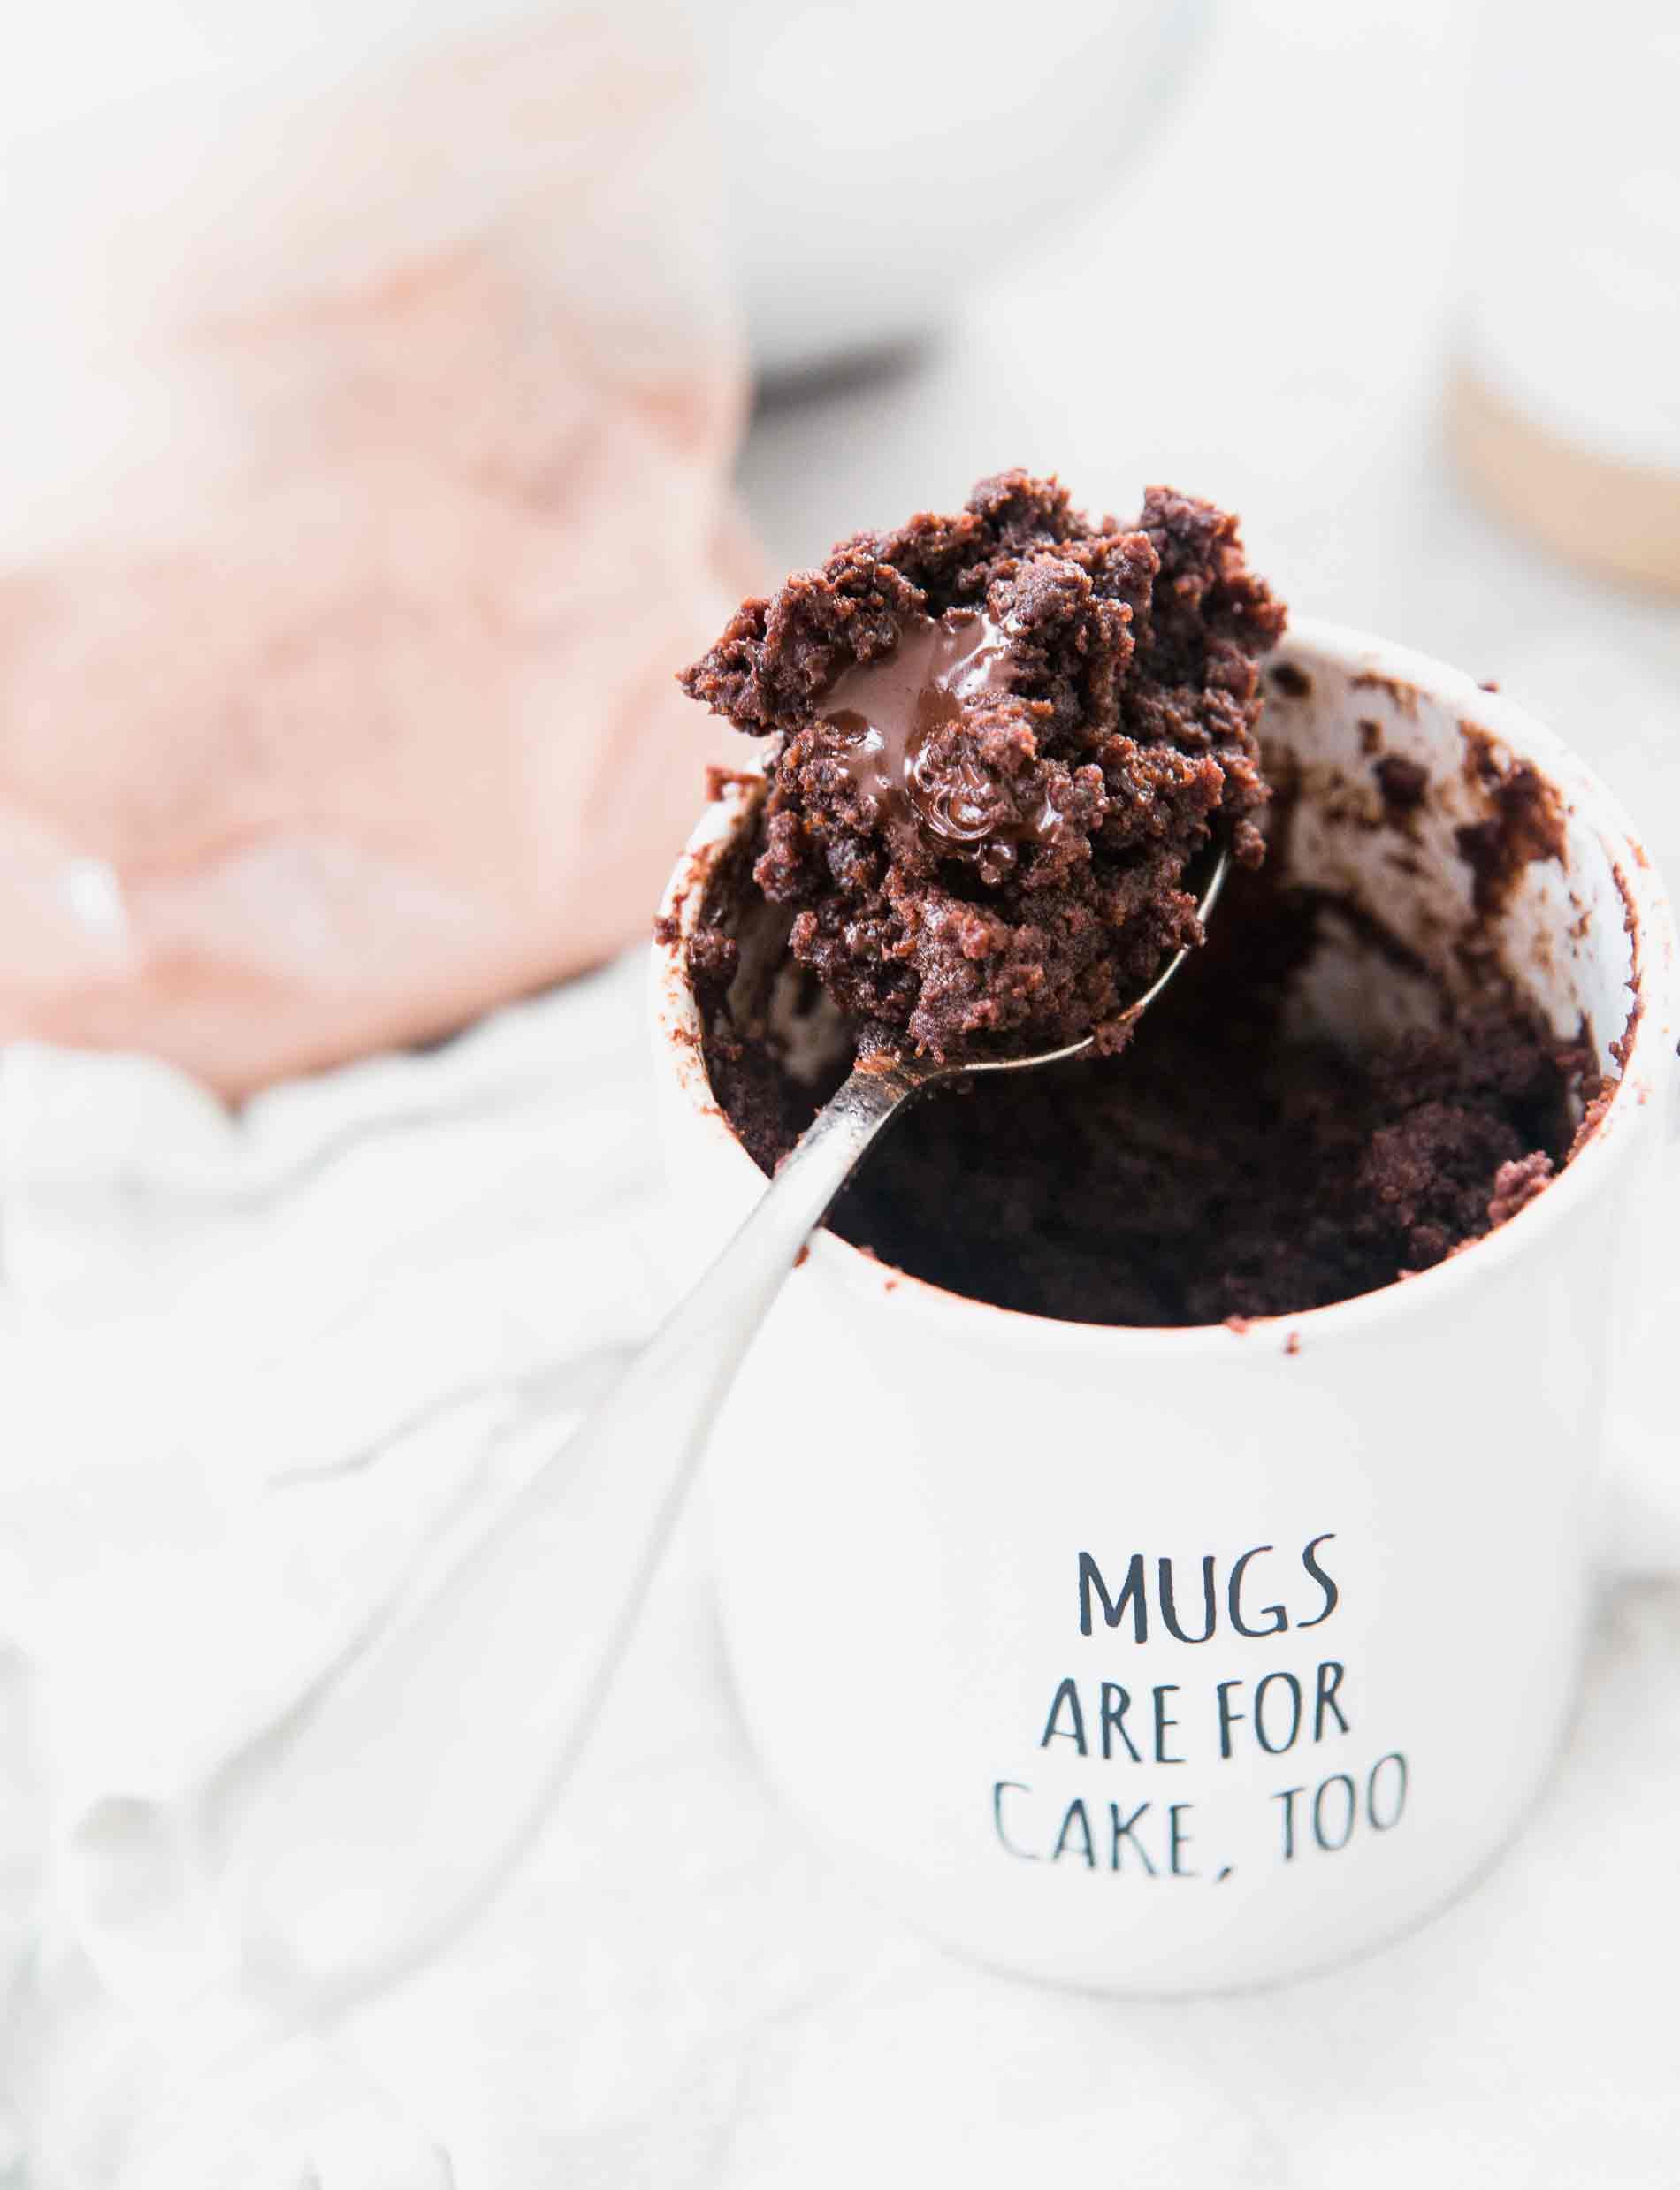 the moistest chocolate mug cake